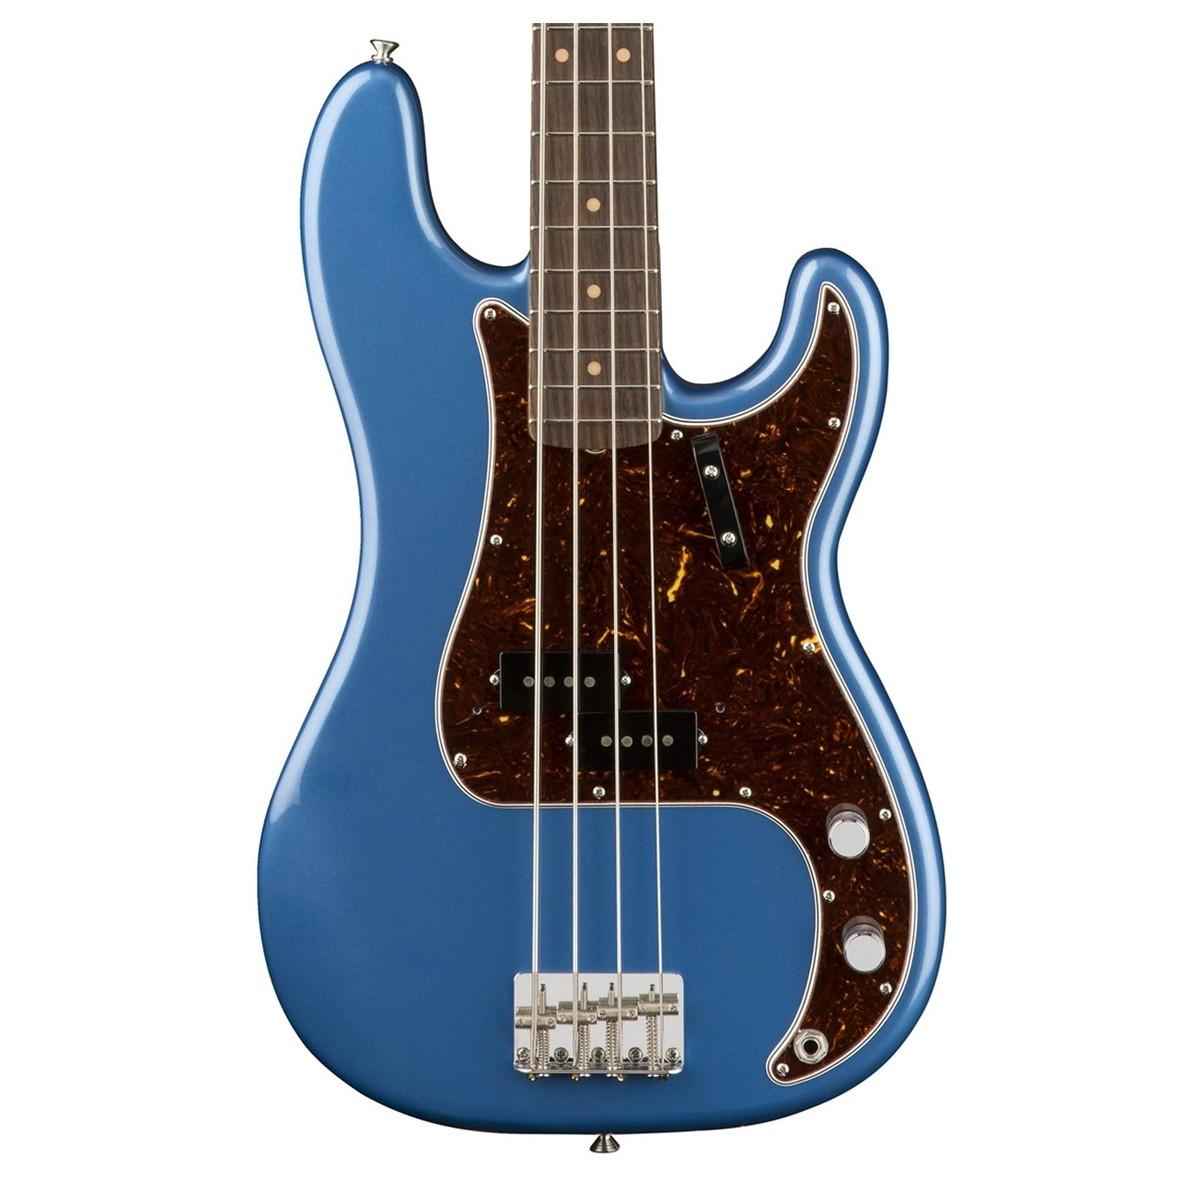 fender american original 39 60s p bass rw lake placid blue at gear4music. Black Bedroom Furniture Sets. Home Design Ideas